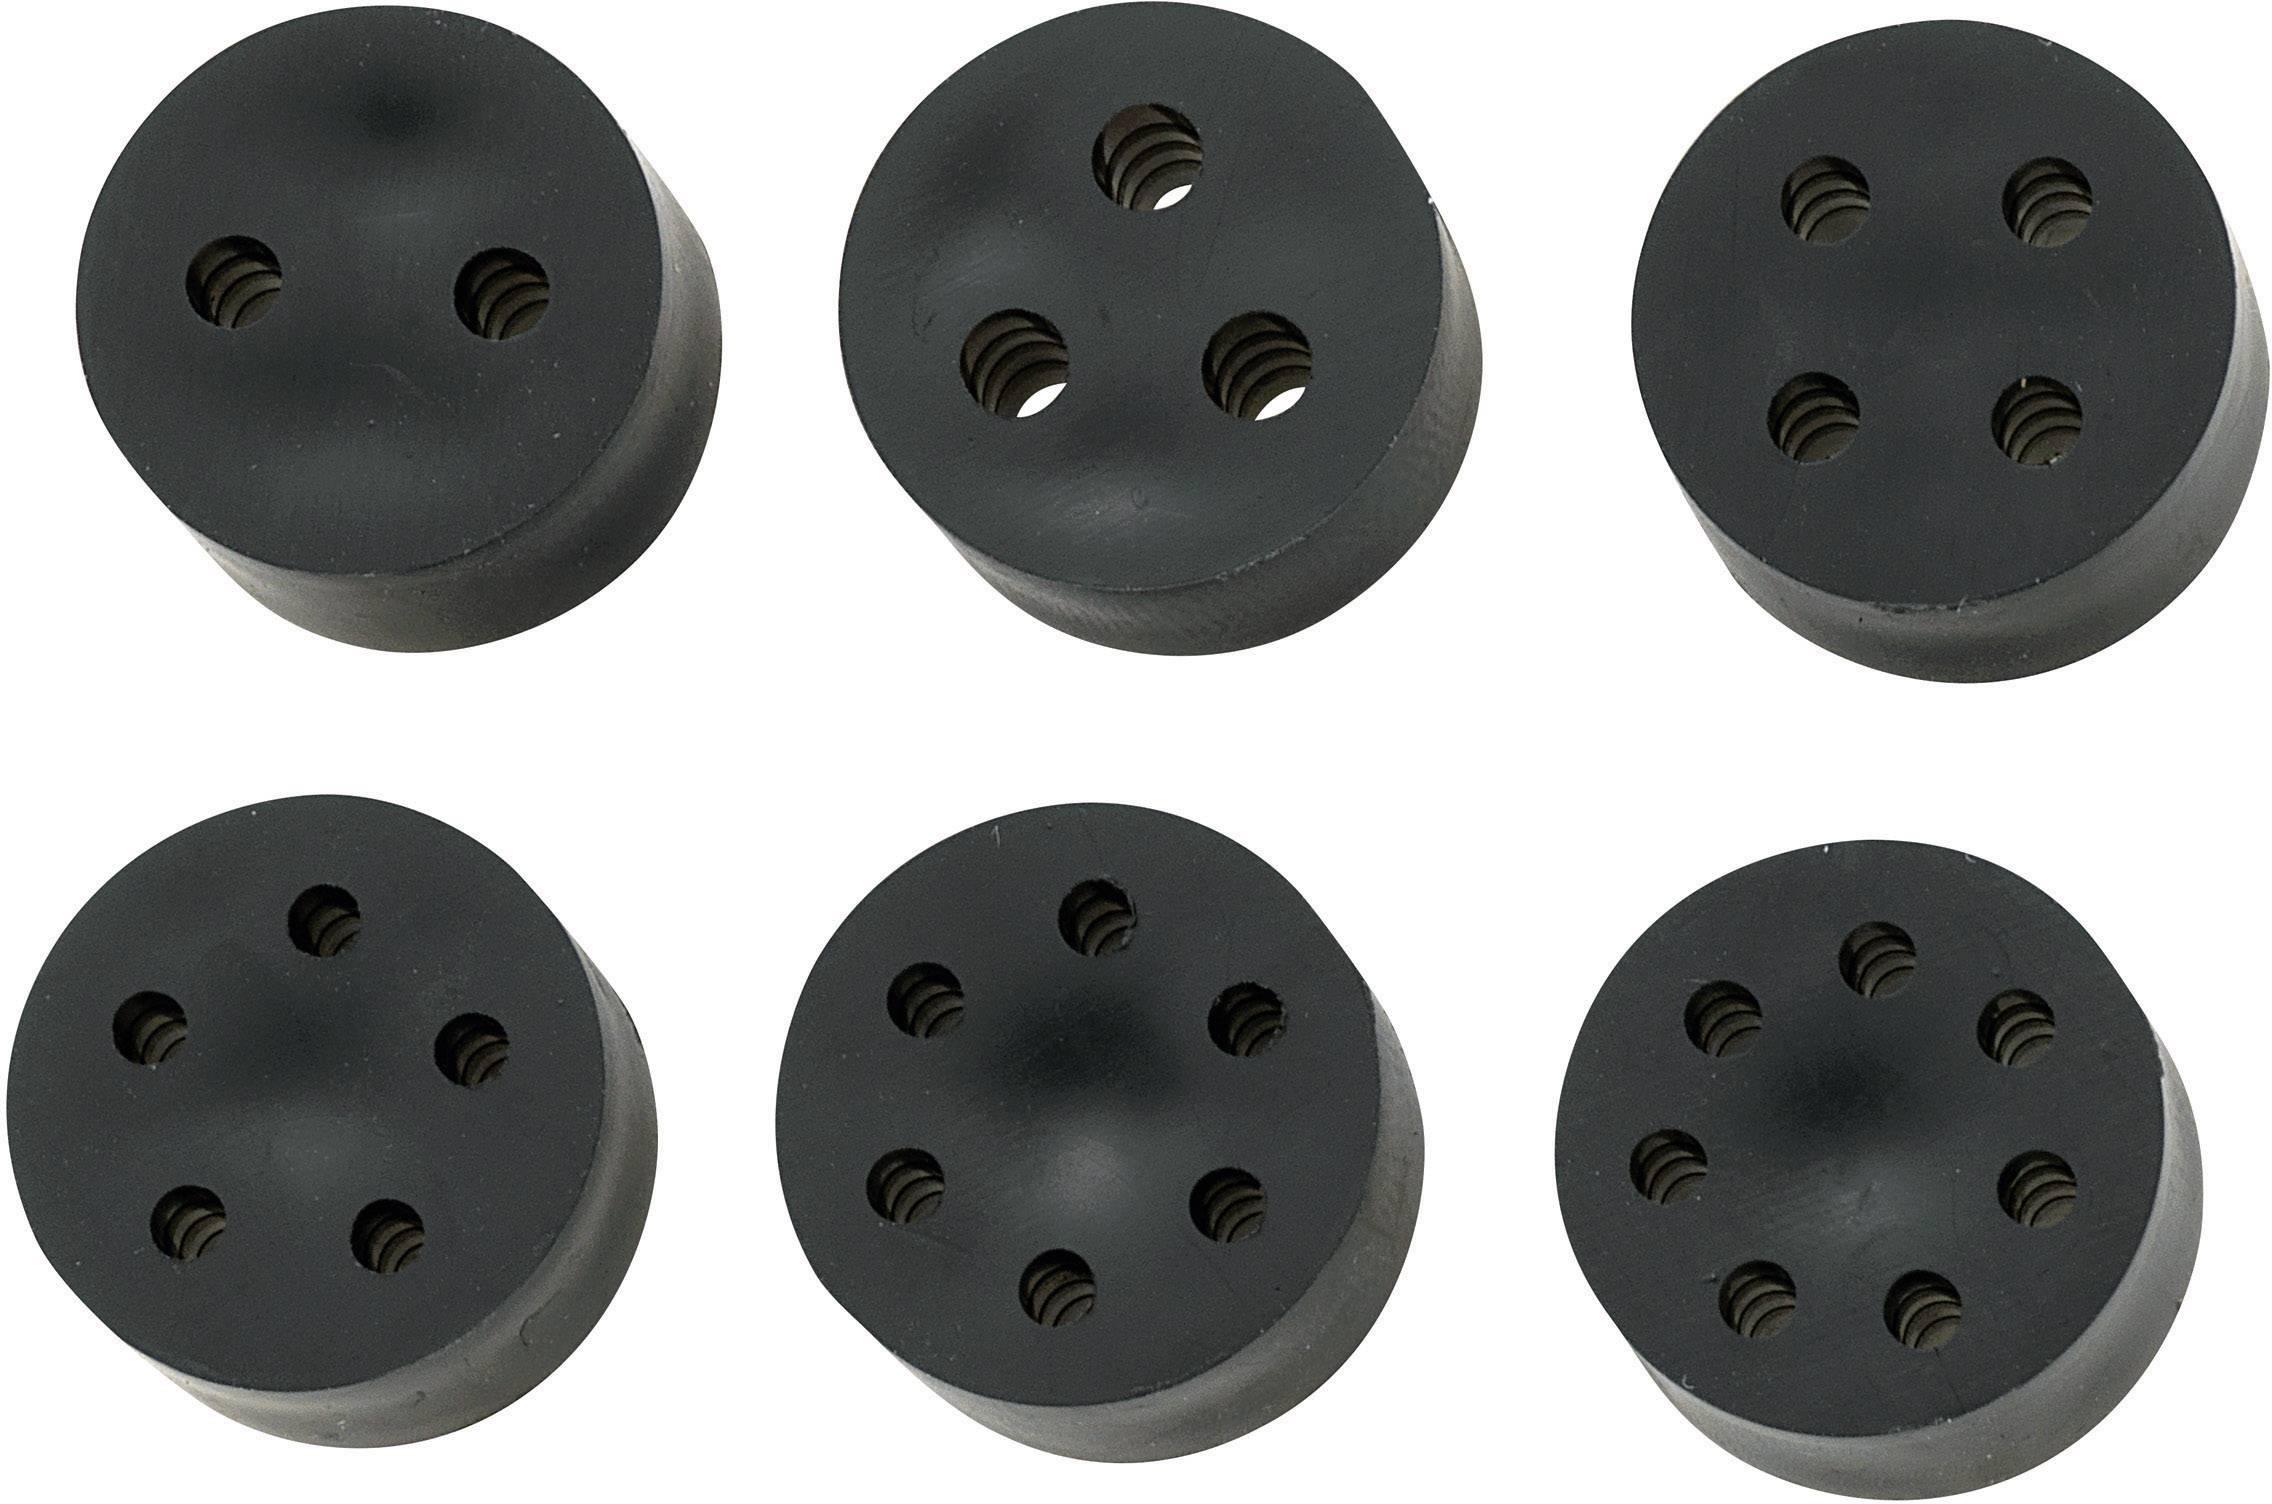 Tesniaca vložka s viacerými priechodmi KSS MH23-2D, PG21, guma, 1 ks